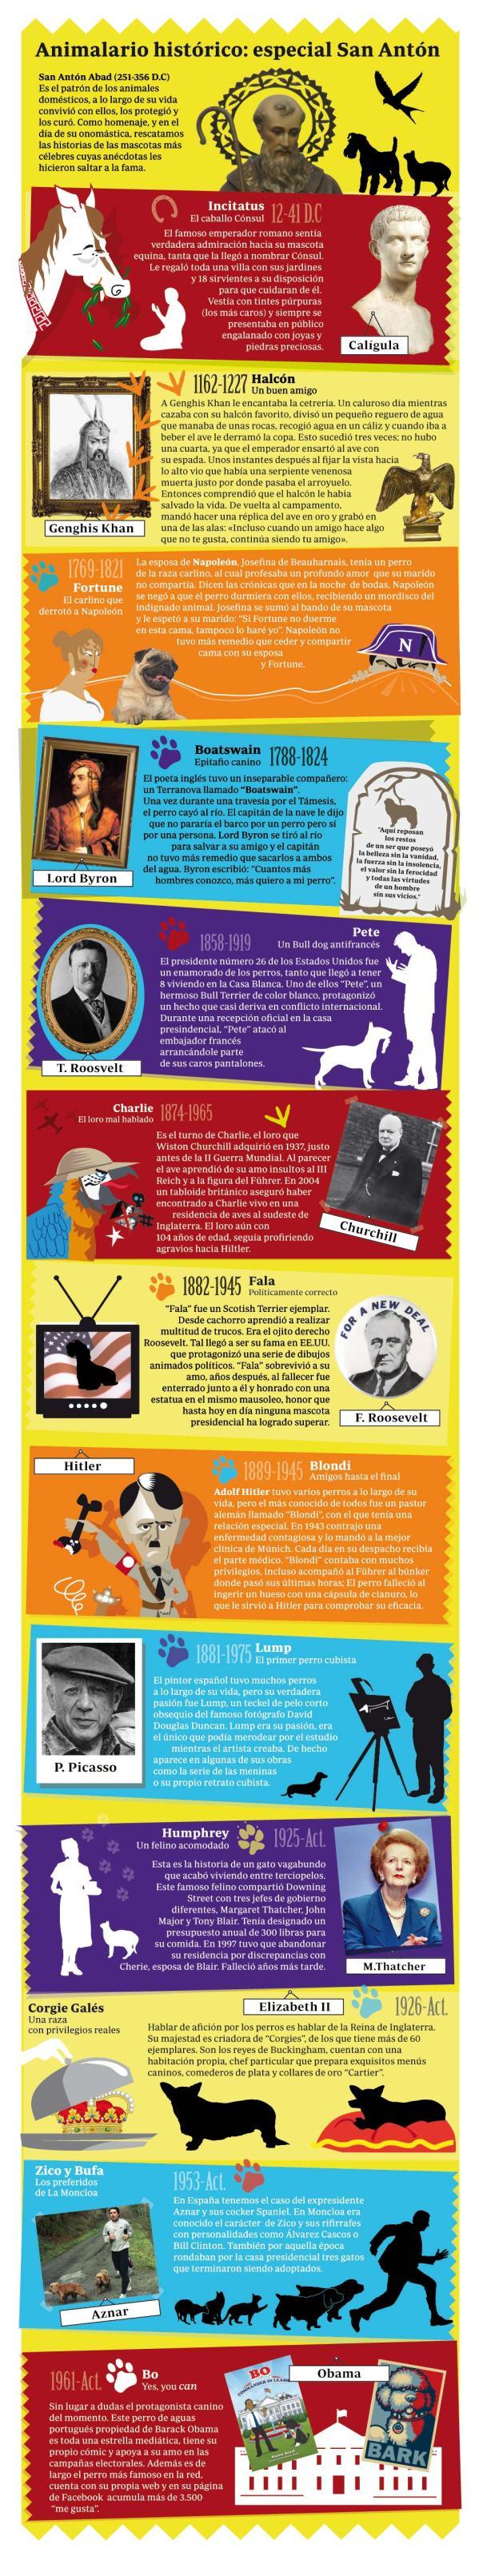 Animales famosos de personajes históricos